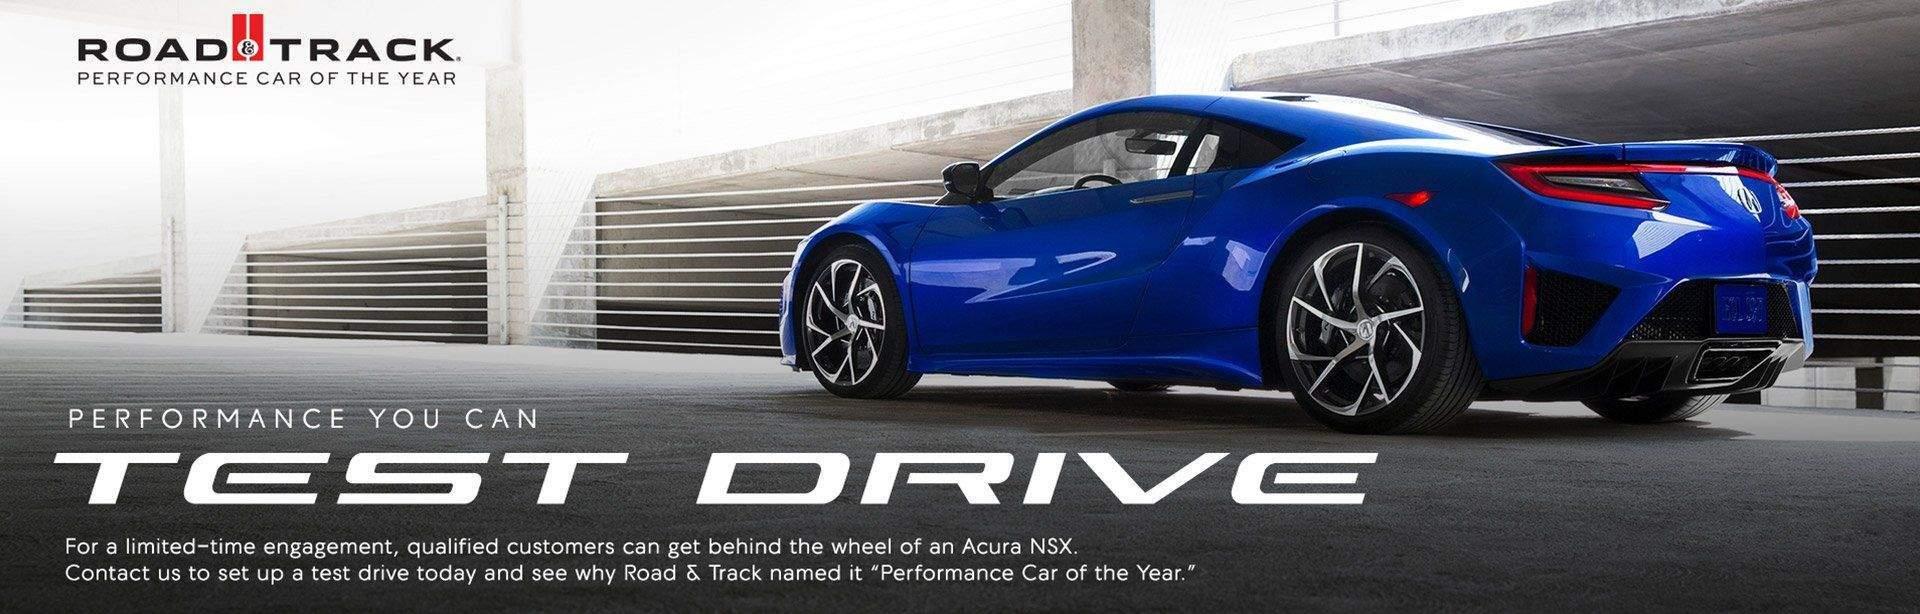 Radley Acura New Used Acura Dealer Serving Fairfax Arlington - Acura dealership in richmond va